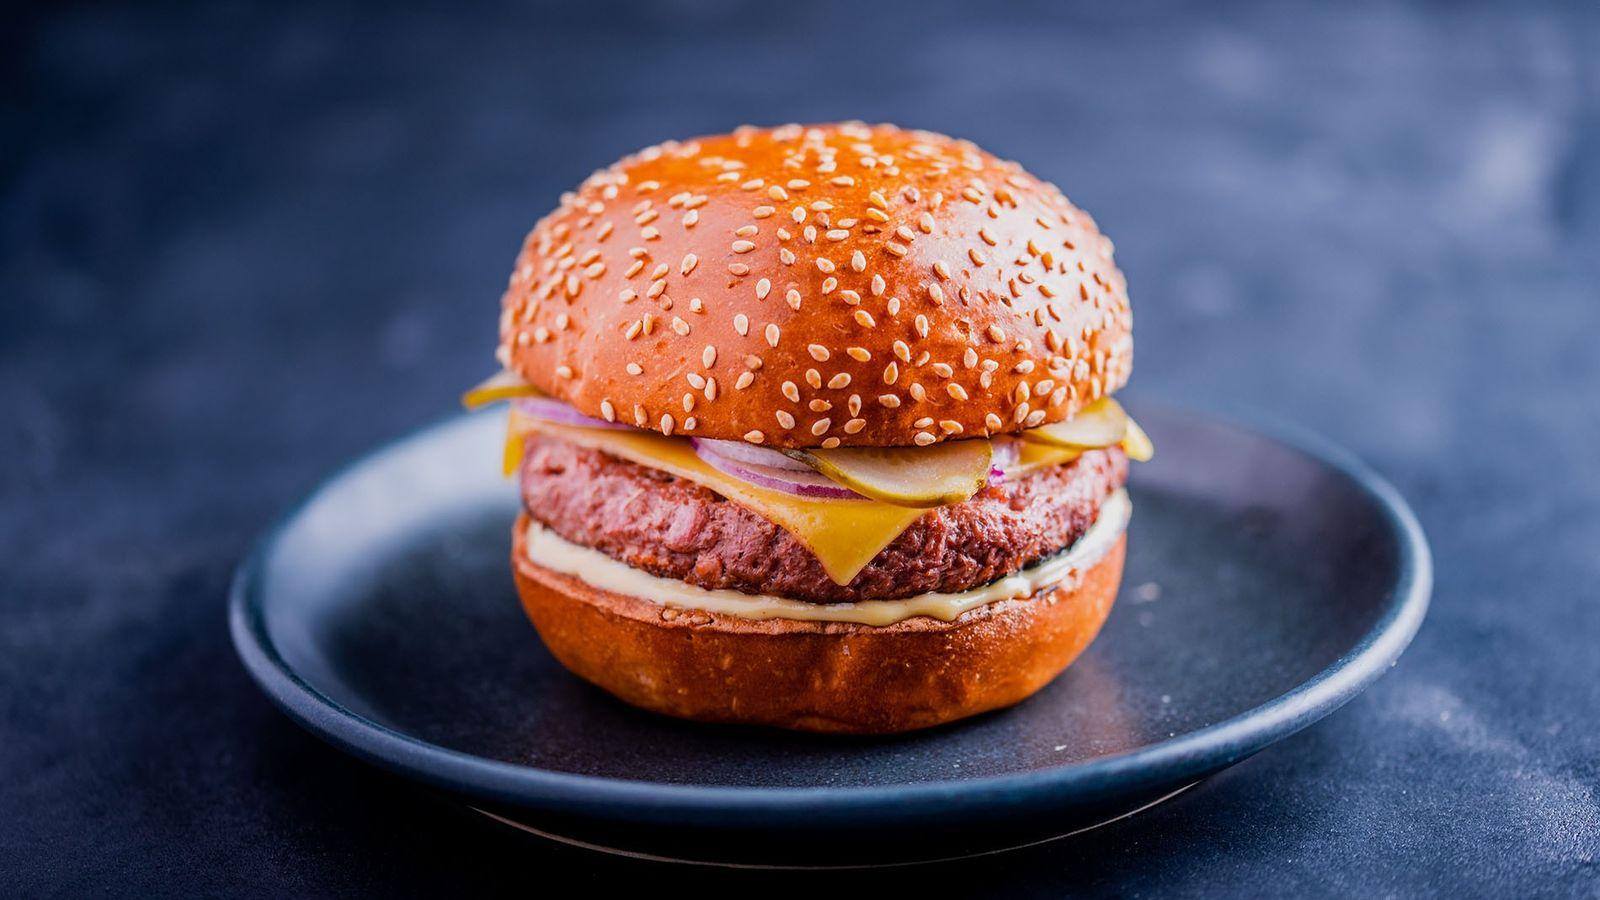 Classic vegan burger from Dirty Bones.